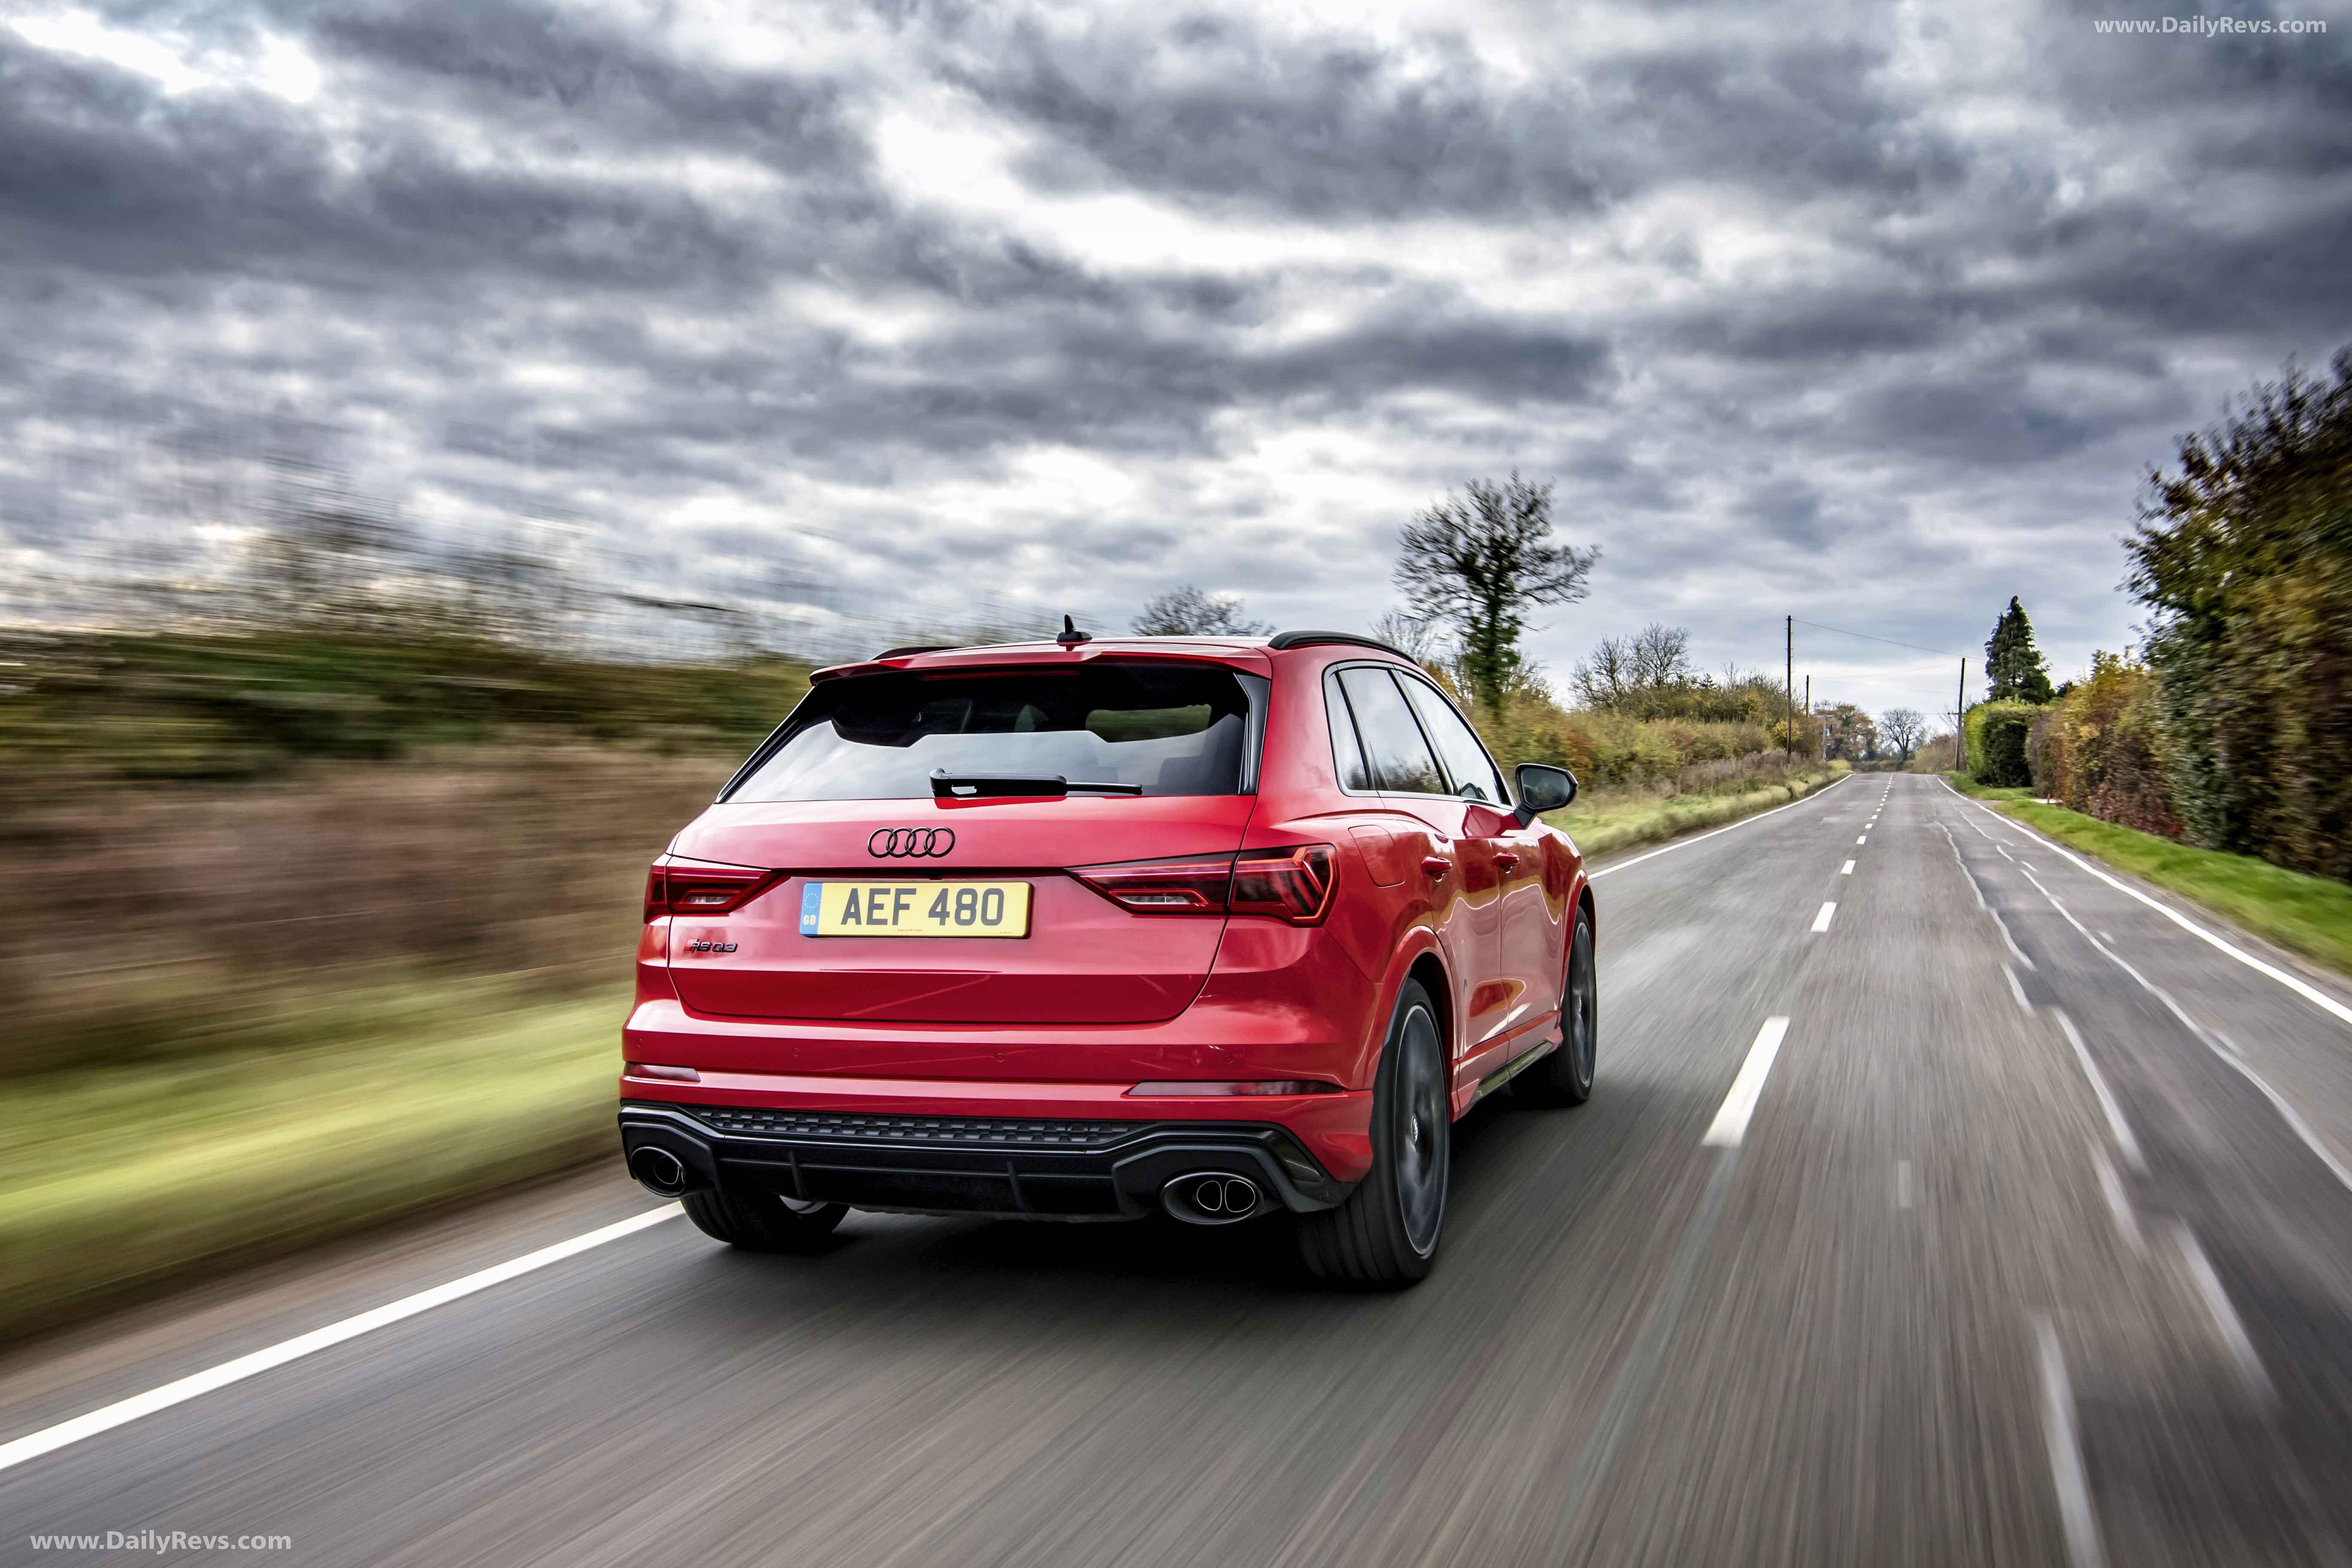 2020 Audi RS Q3 UK - HD Pictures, Videos, Specs ...